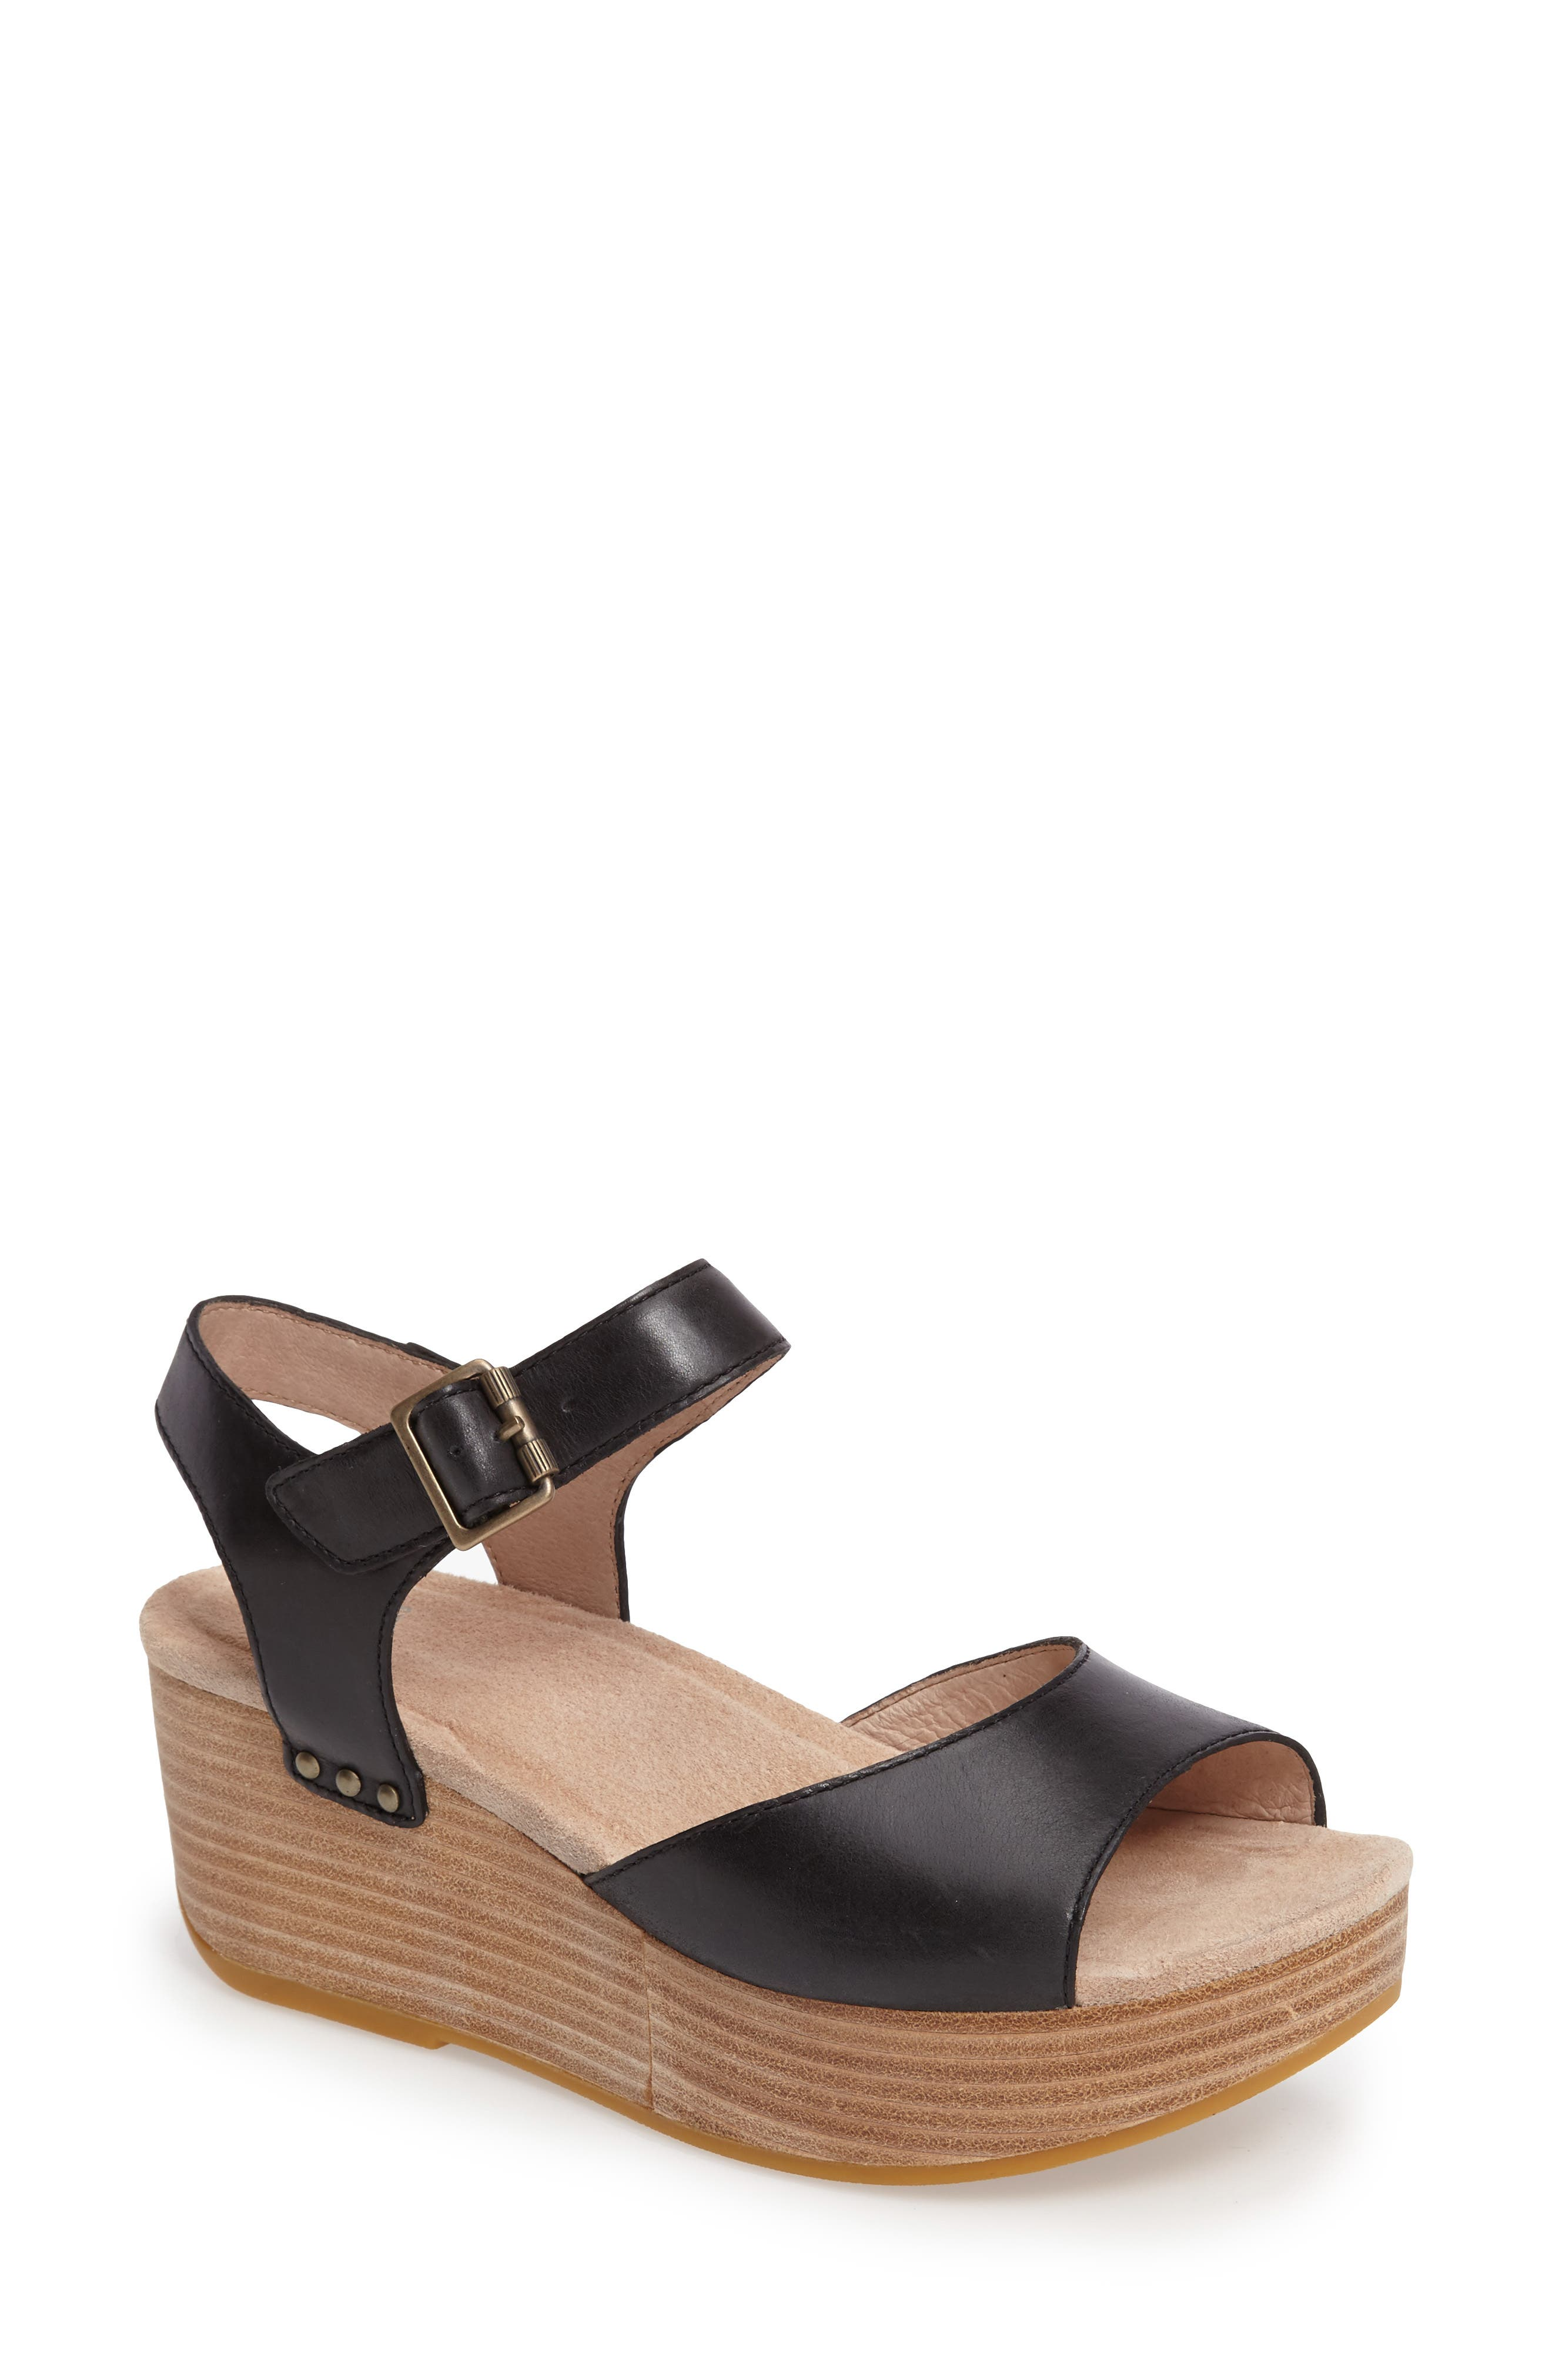 Silvie Platform Wedge Sandal,                             Main thumbnail 1, color,                             Black Leather